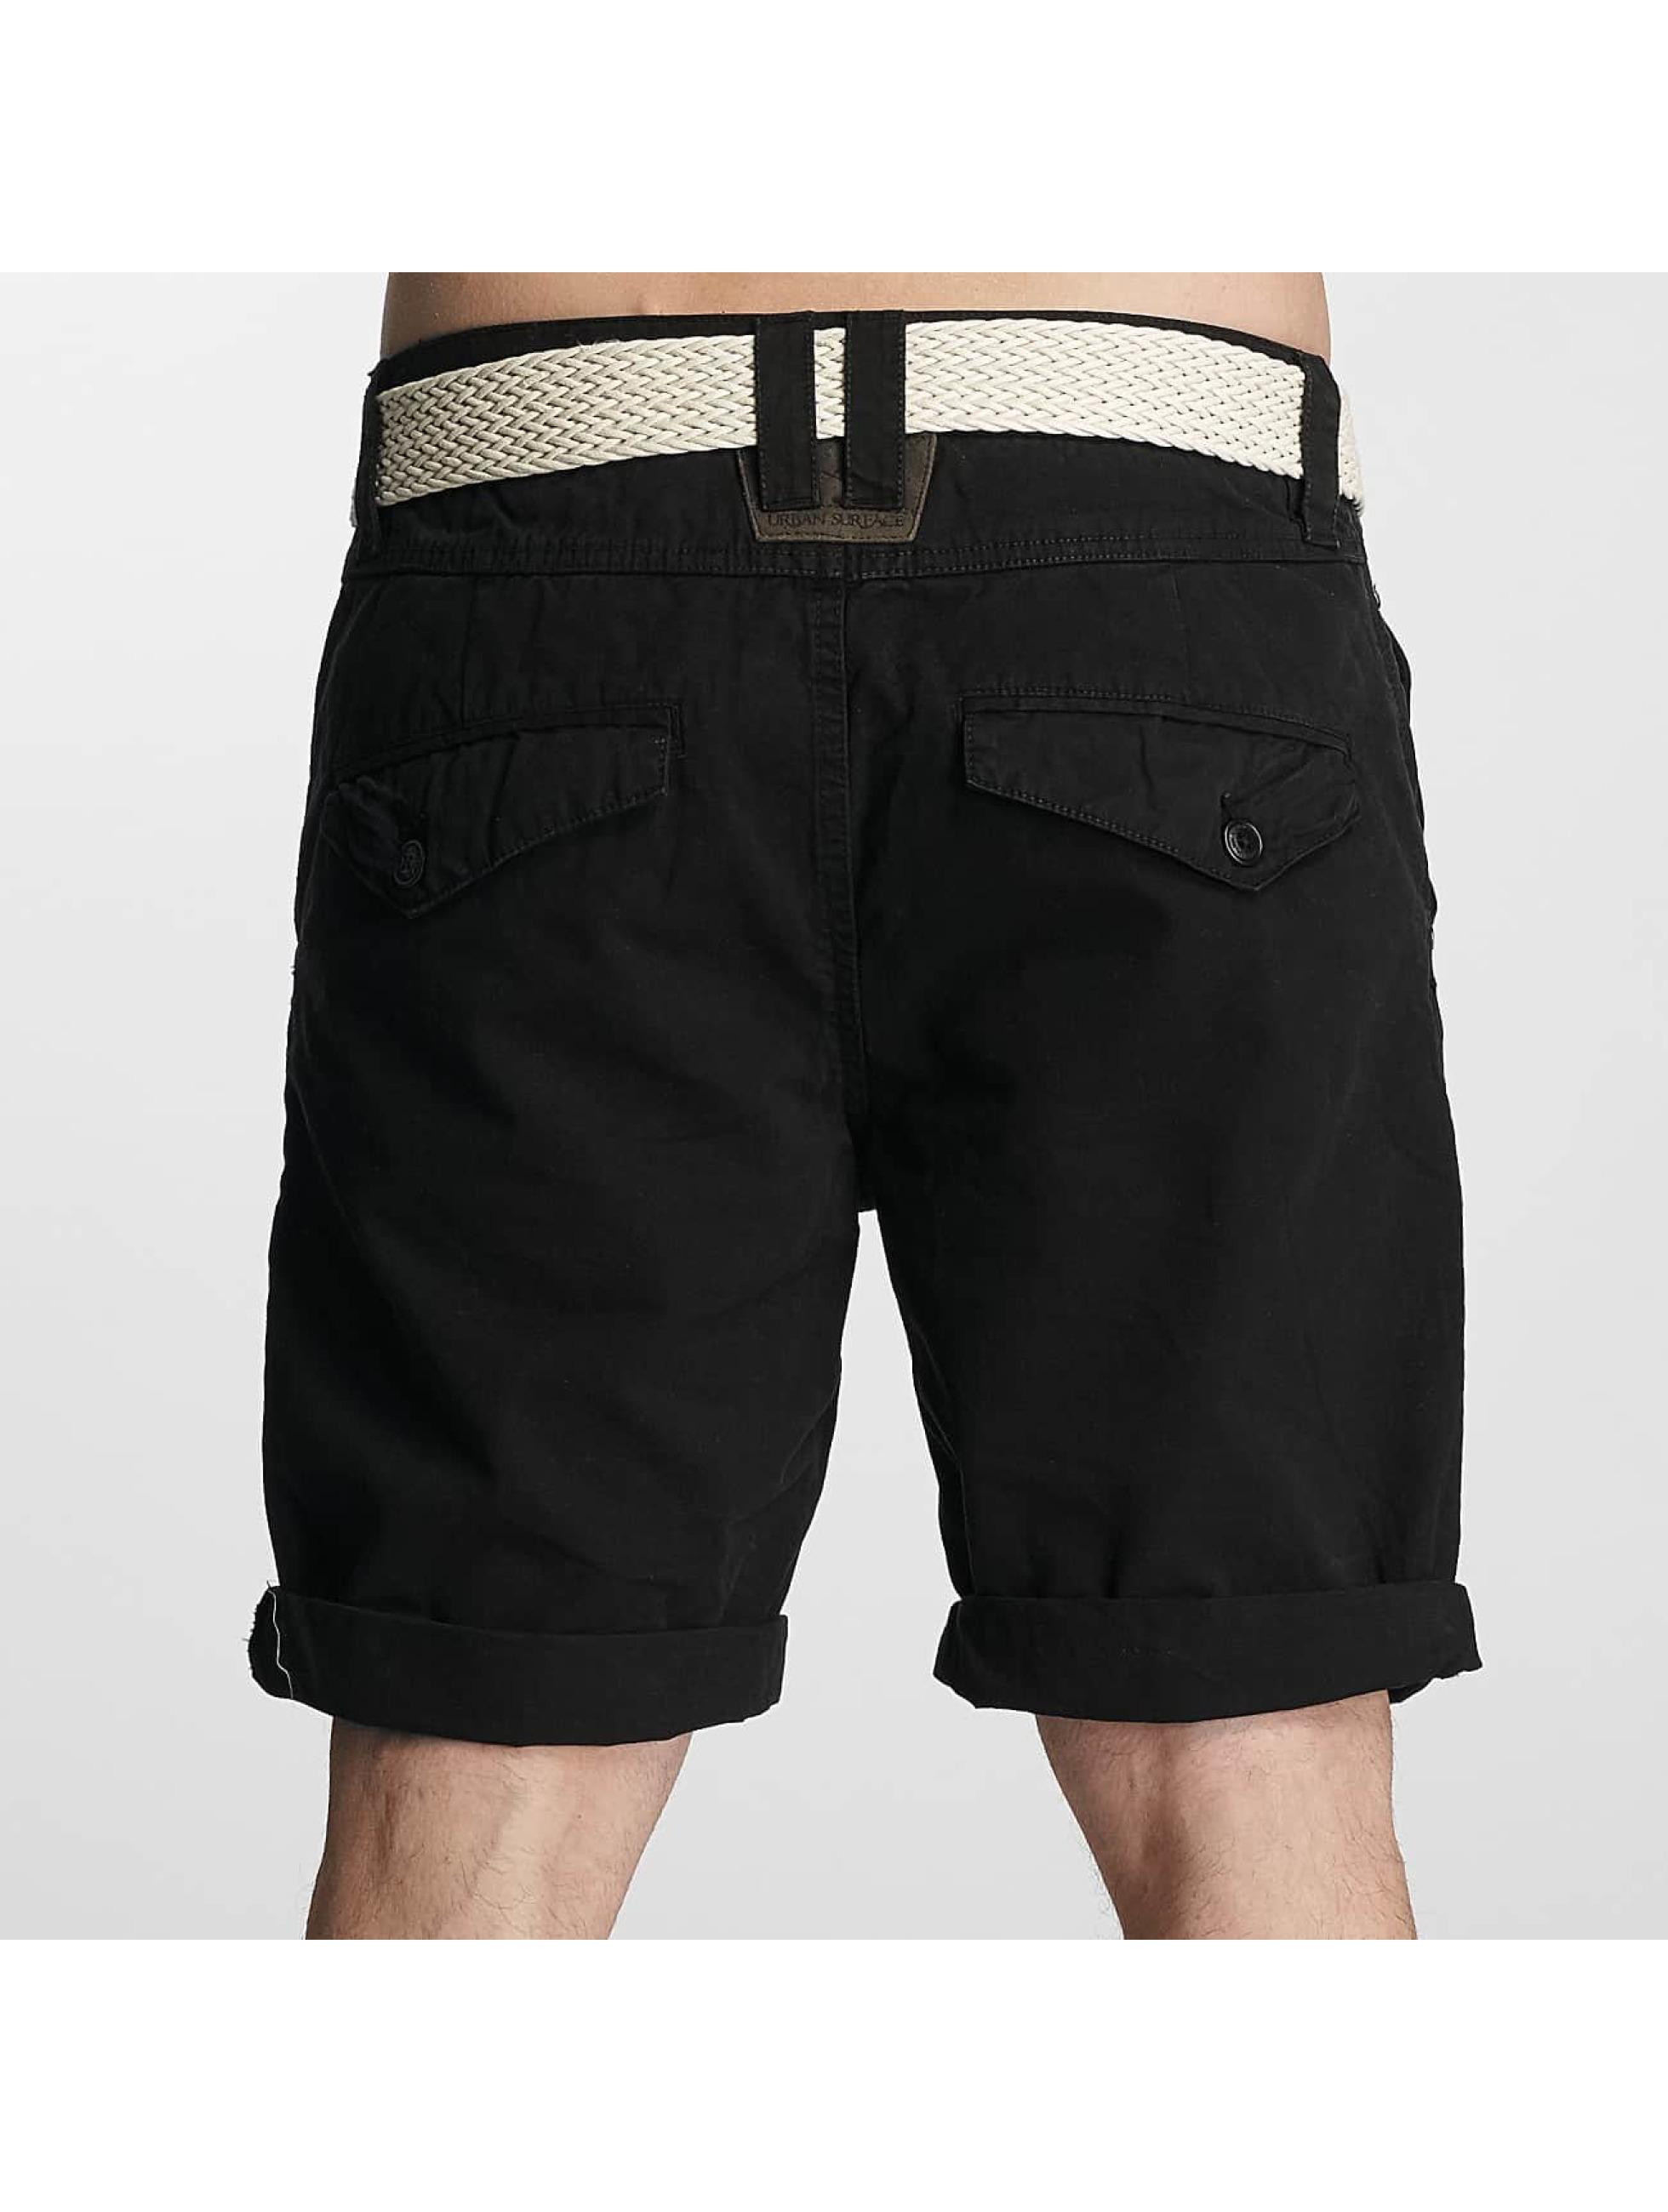 urban surface chino noir homme short urban surface acheter pas cher pantalon 340549. Black Bedroom Furniture Sets. Home Design Ideas